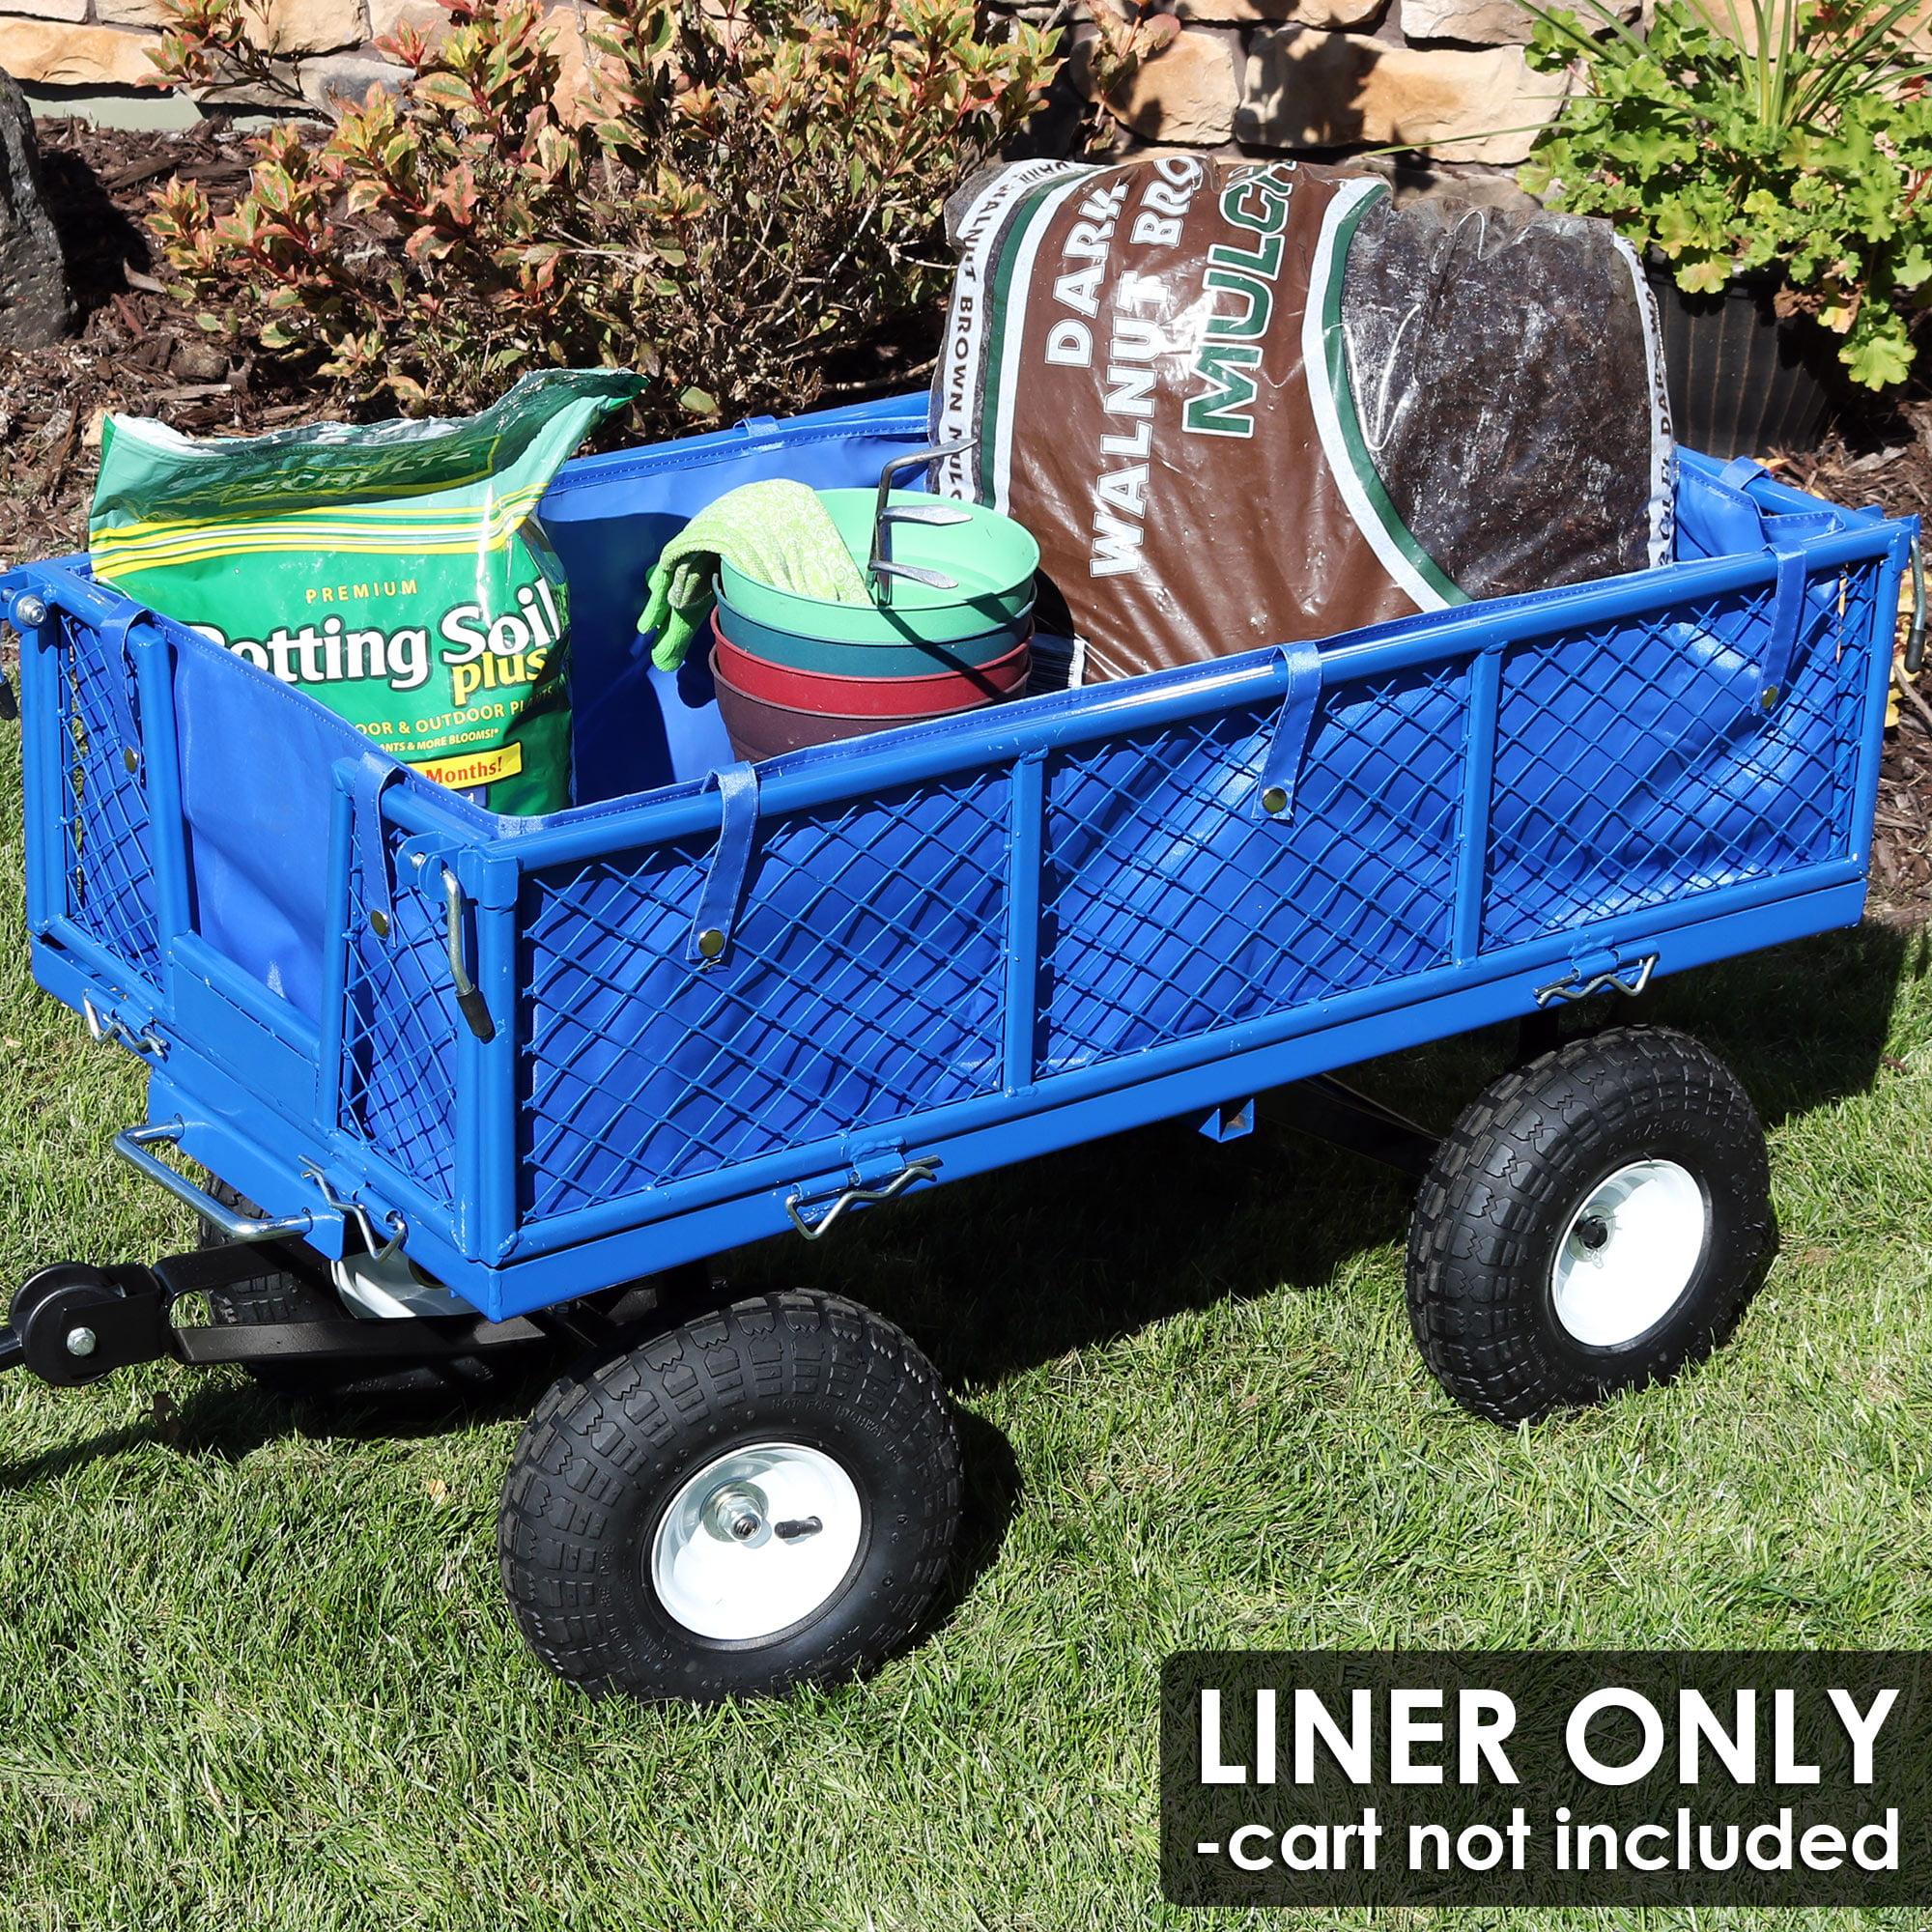 Sunnydaze Liner for Heavy-Duty Dump Cart, Heavy-Duty Polyester, Blue, Liner ONLY